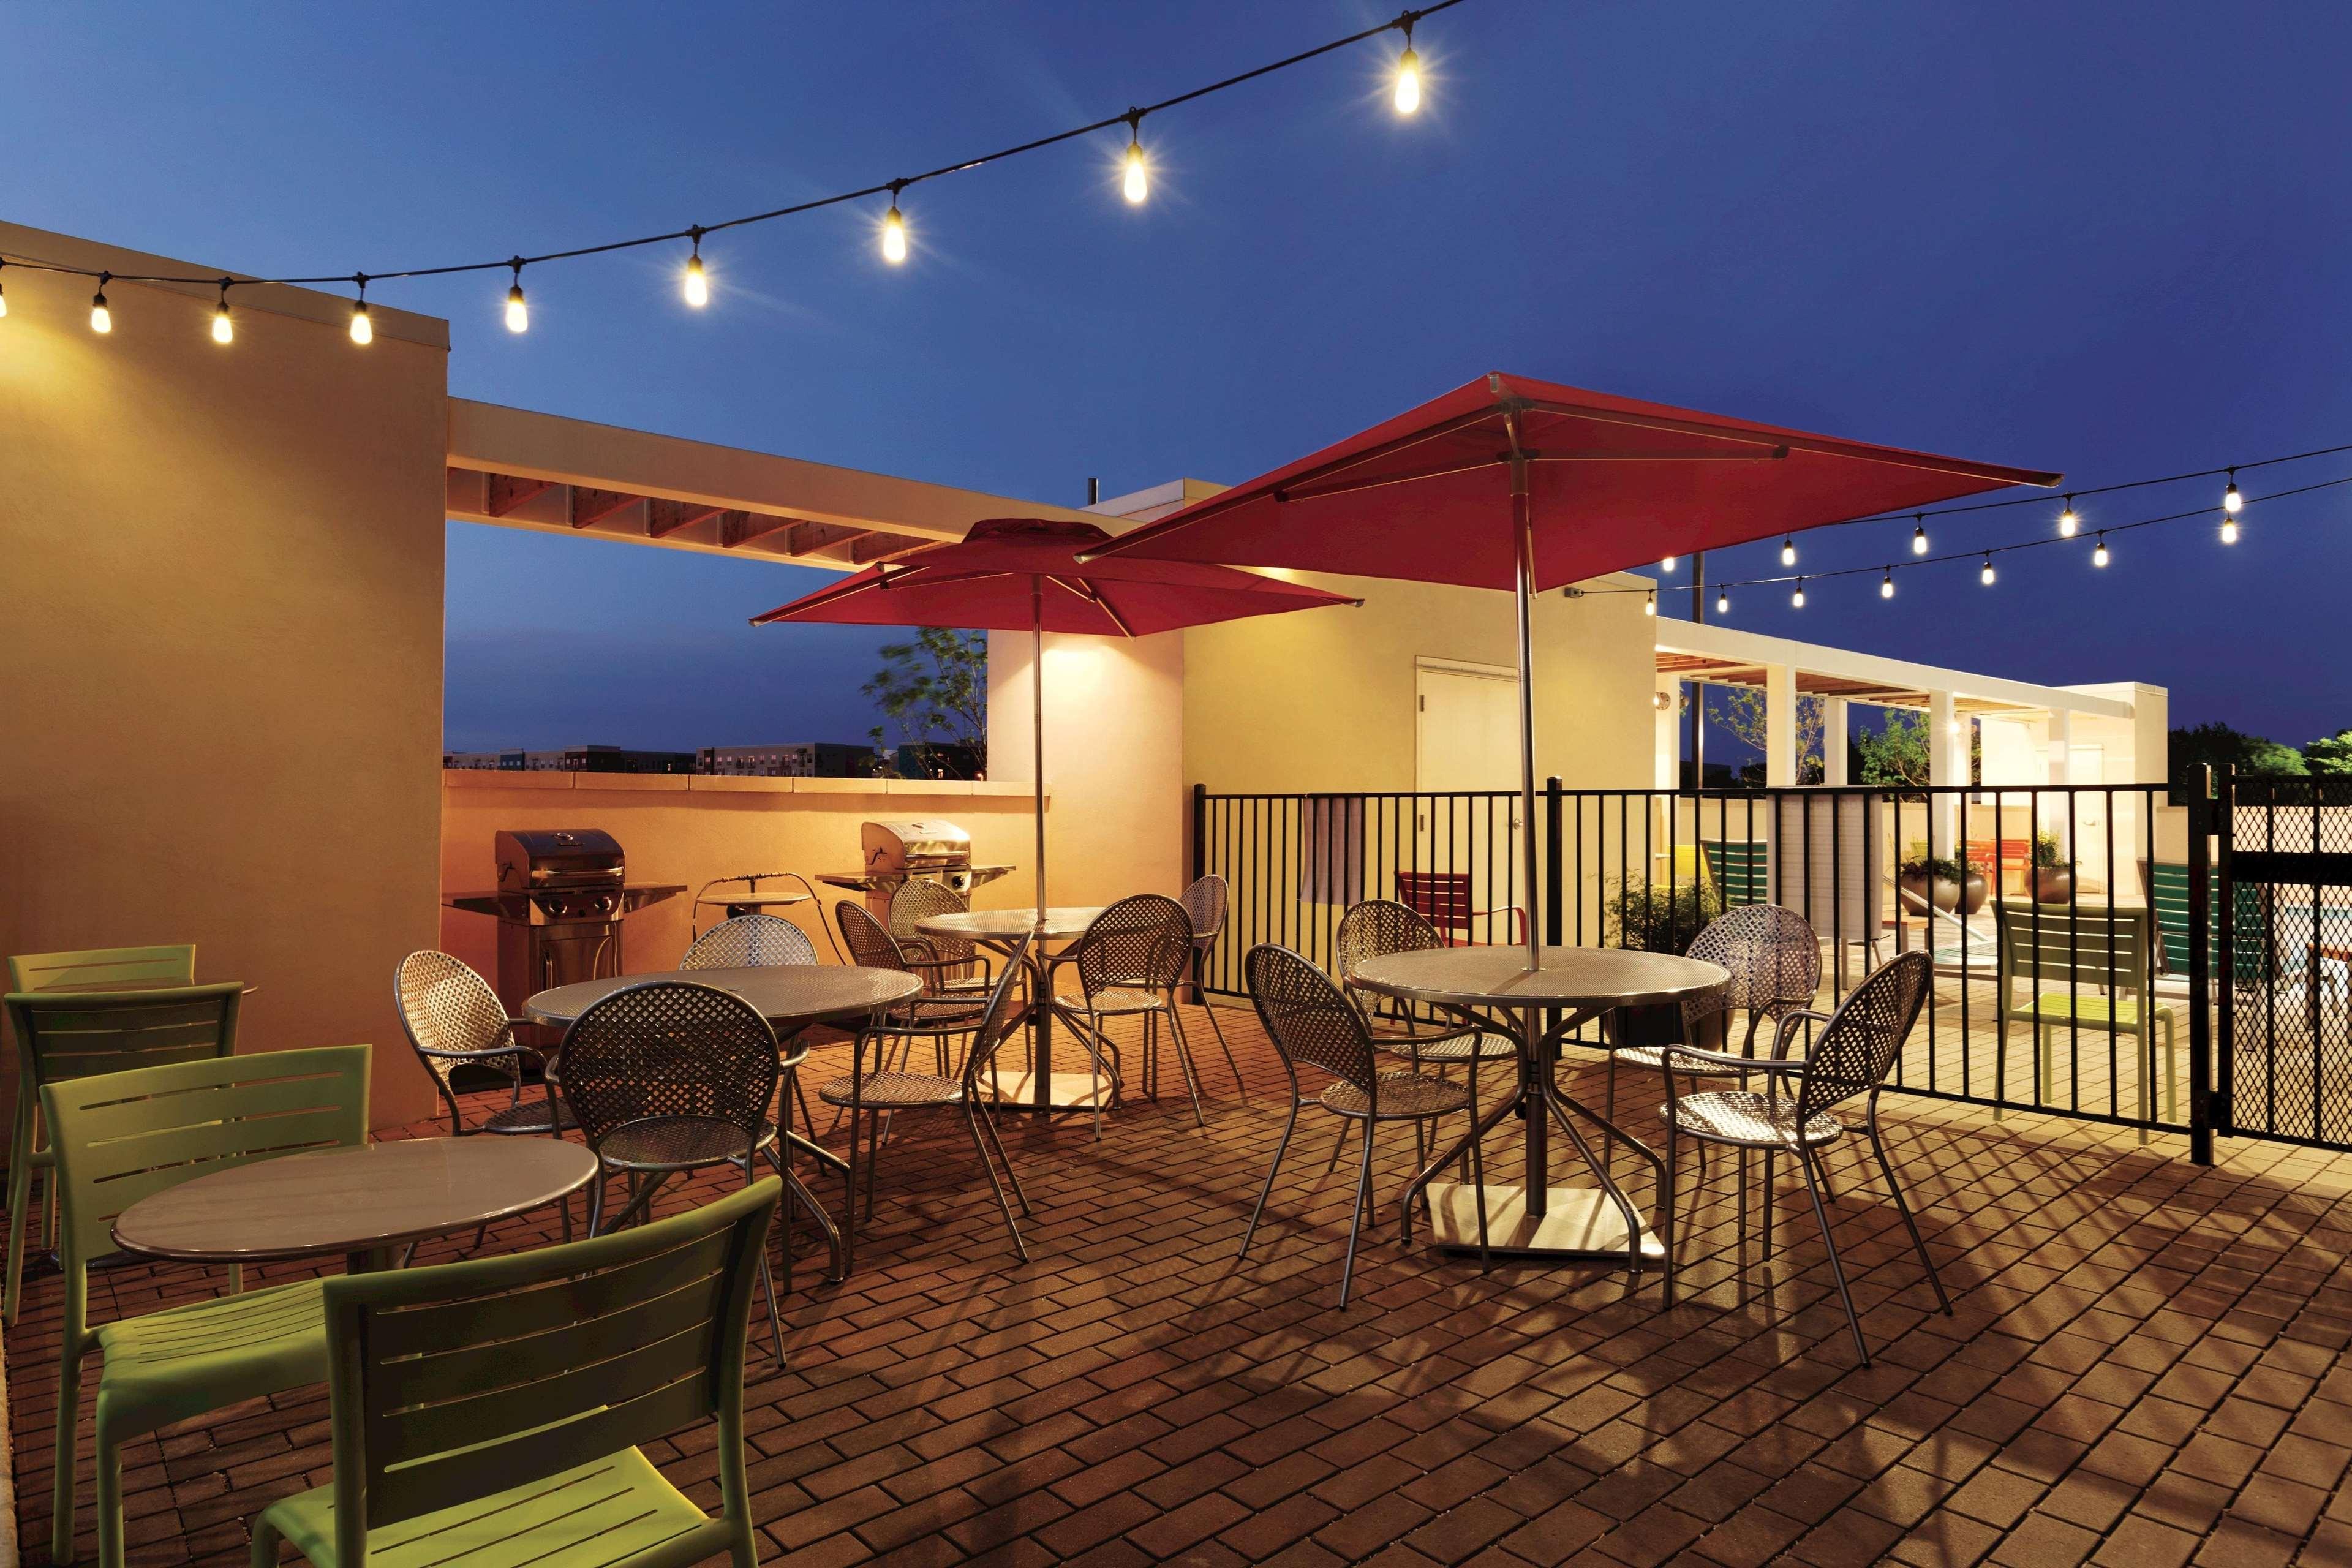 Home2 Suites by Hilton Austin Round Rock image 14